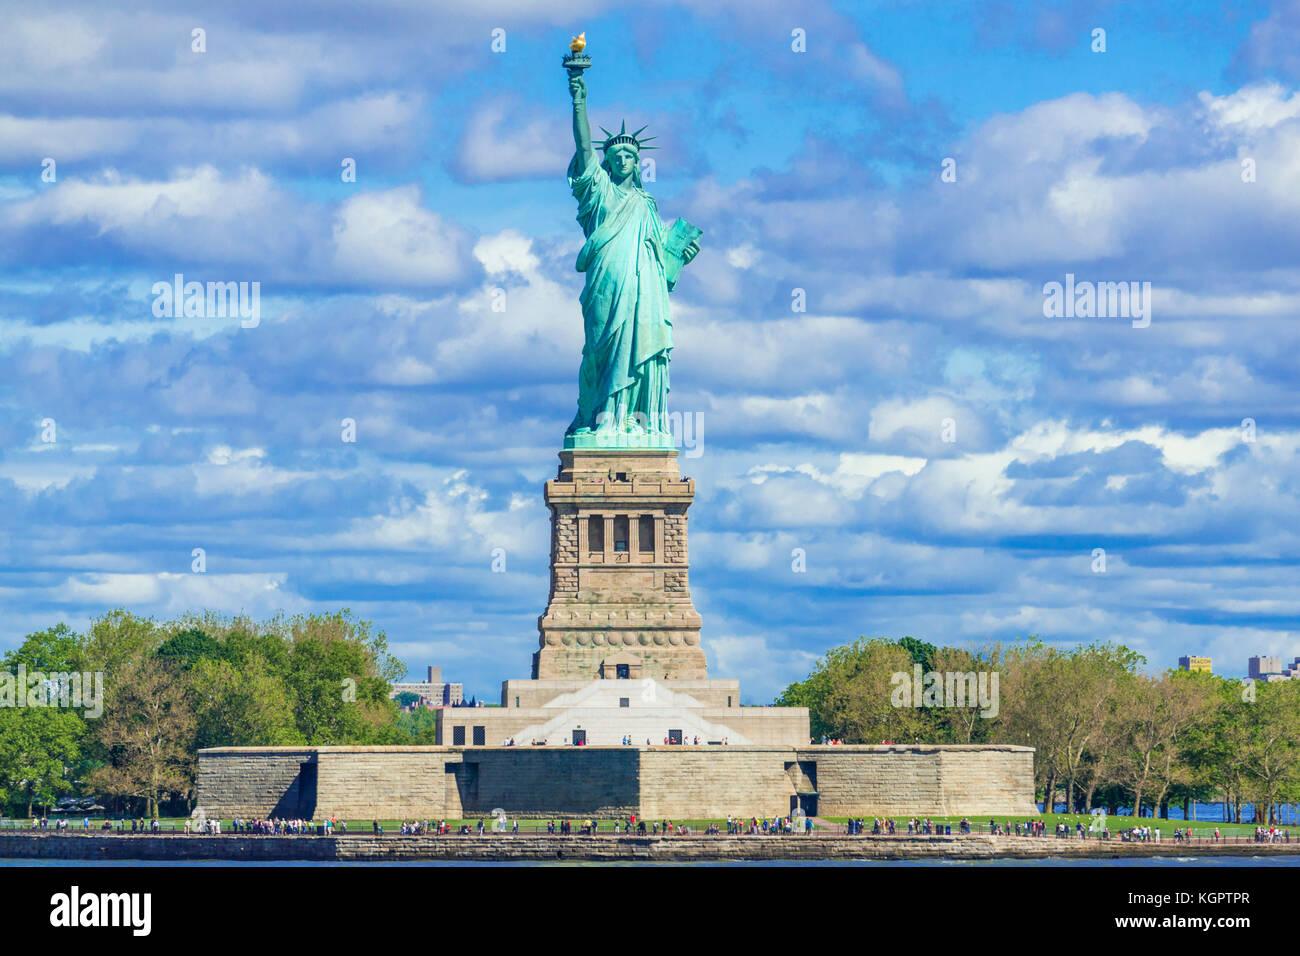 Freiheitsstatue New York Freiheitsstatue New York Statue of Liberty Island New York State usa us Vereinigte Staaten Stockbild